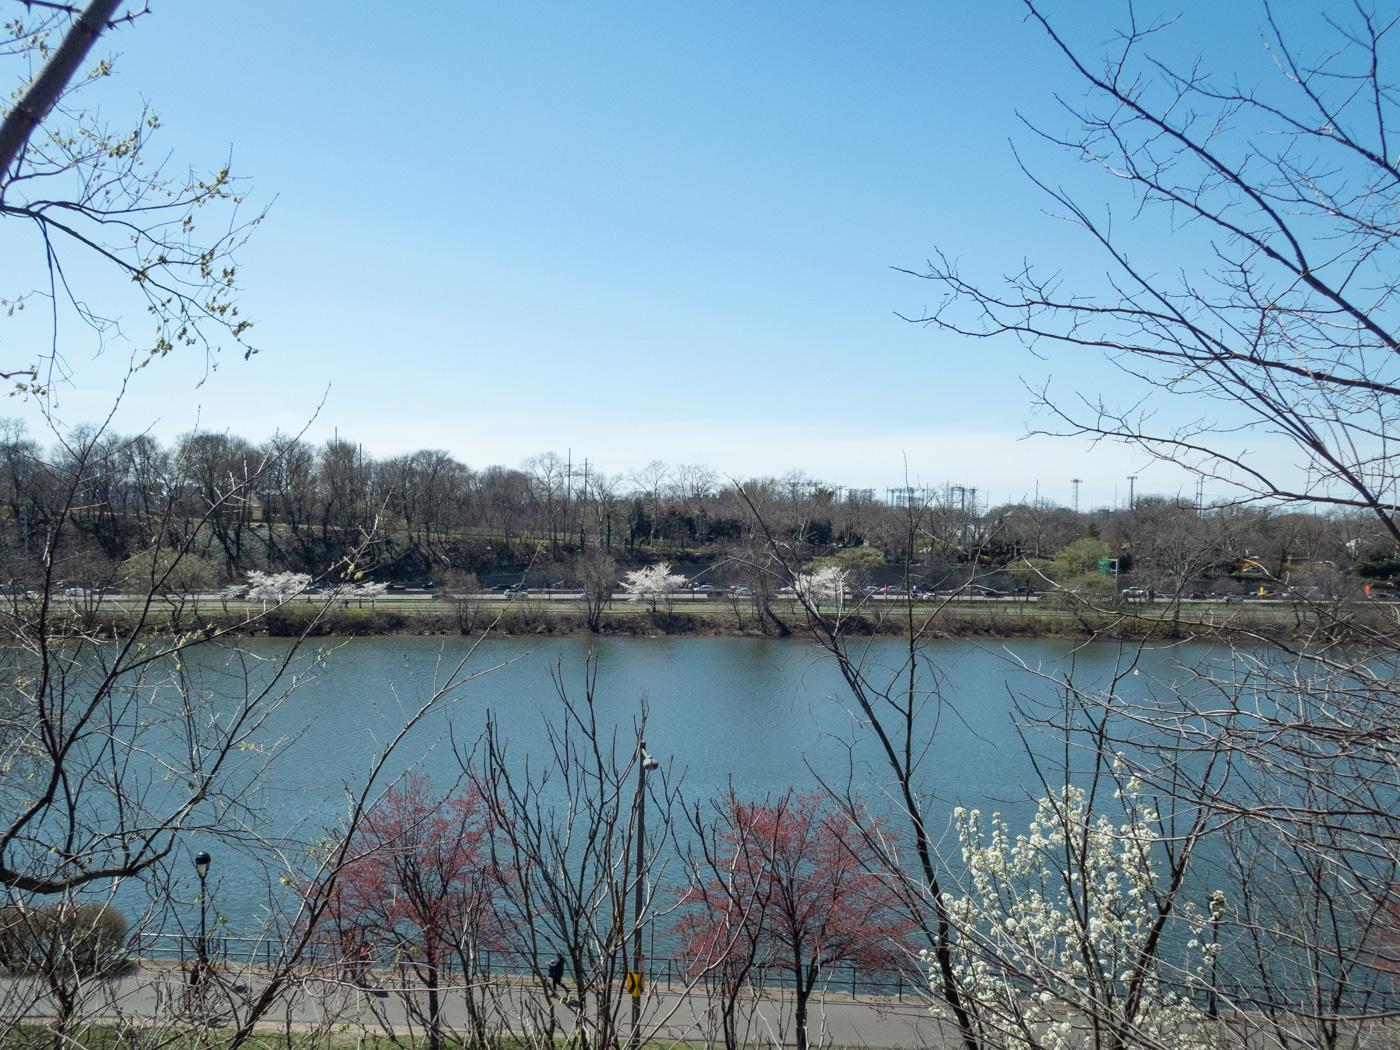 Spring Trees along the Schuylkill River